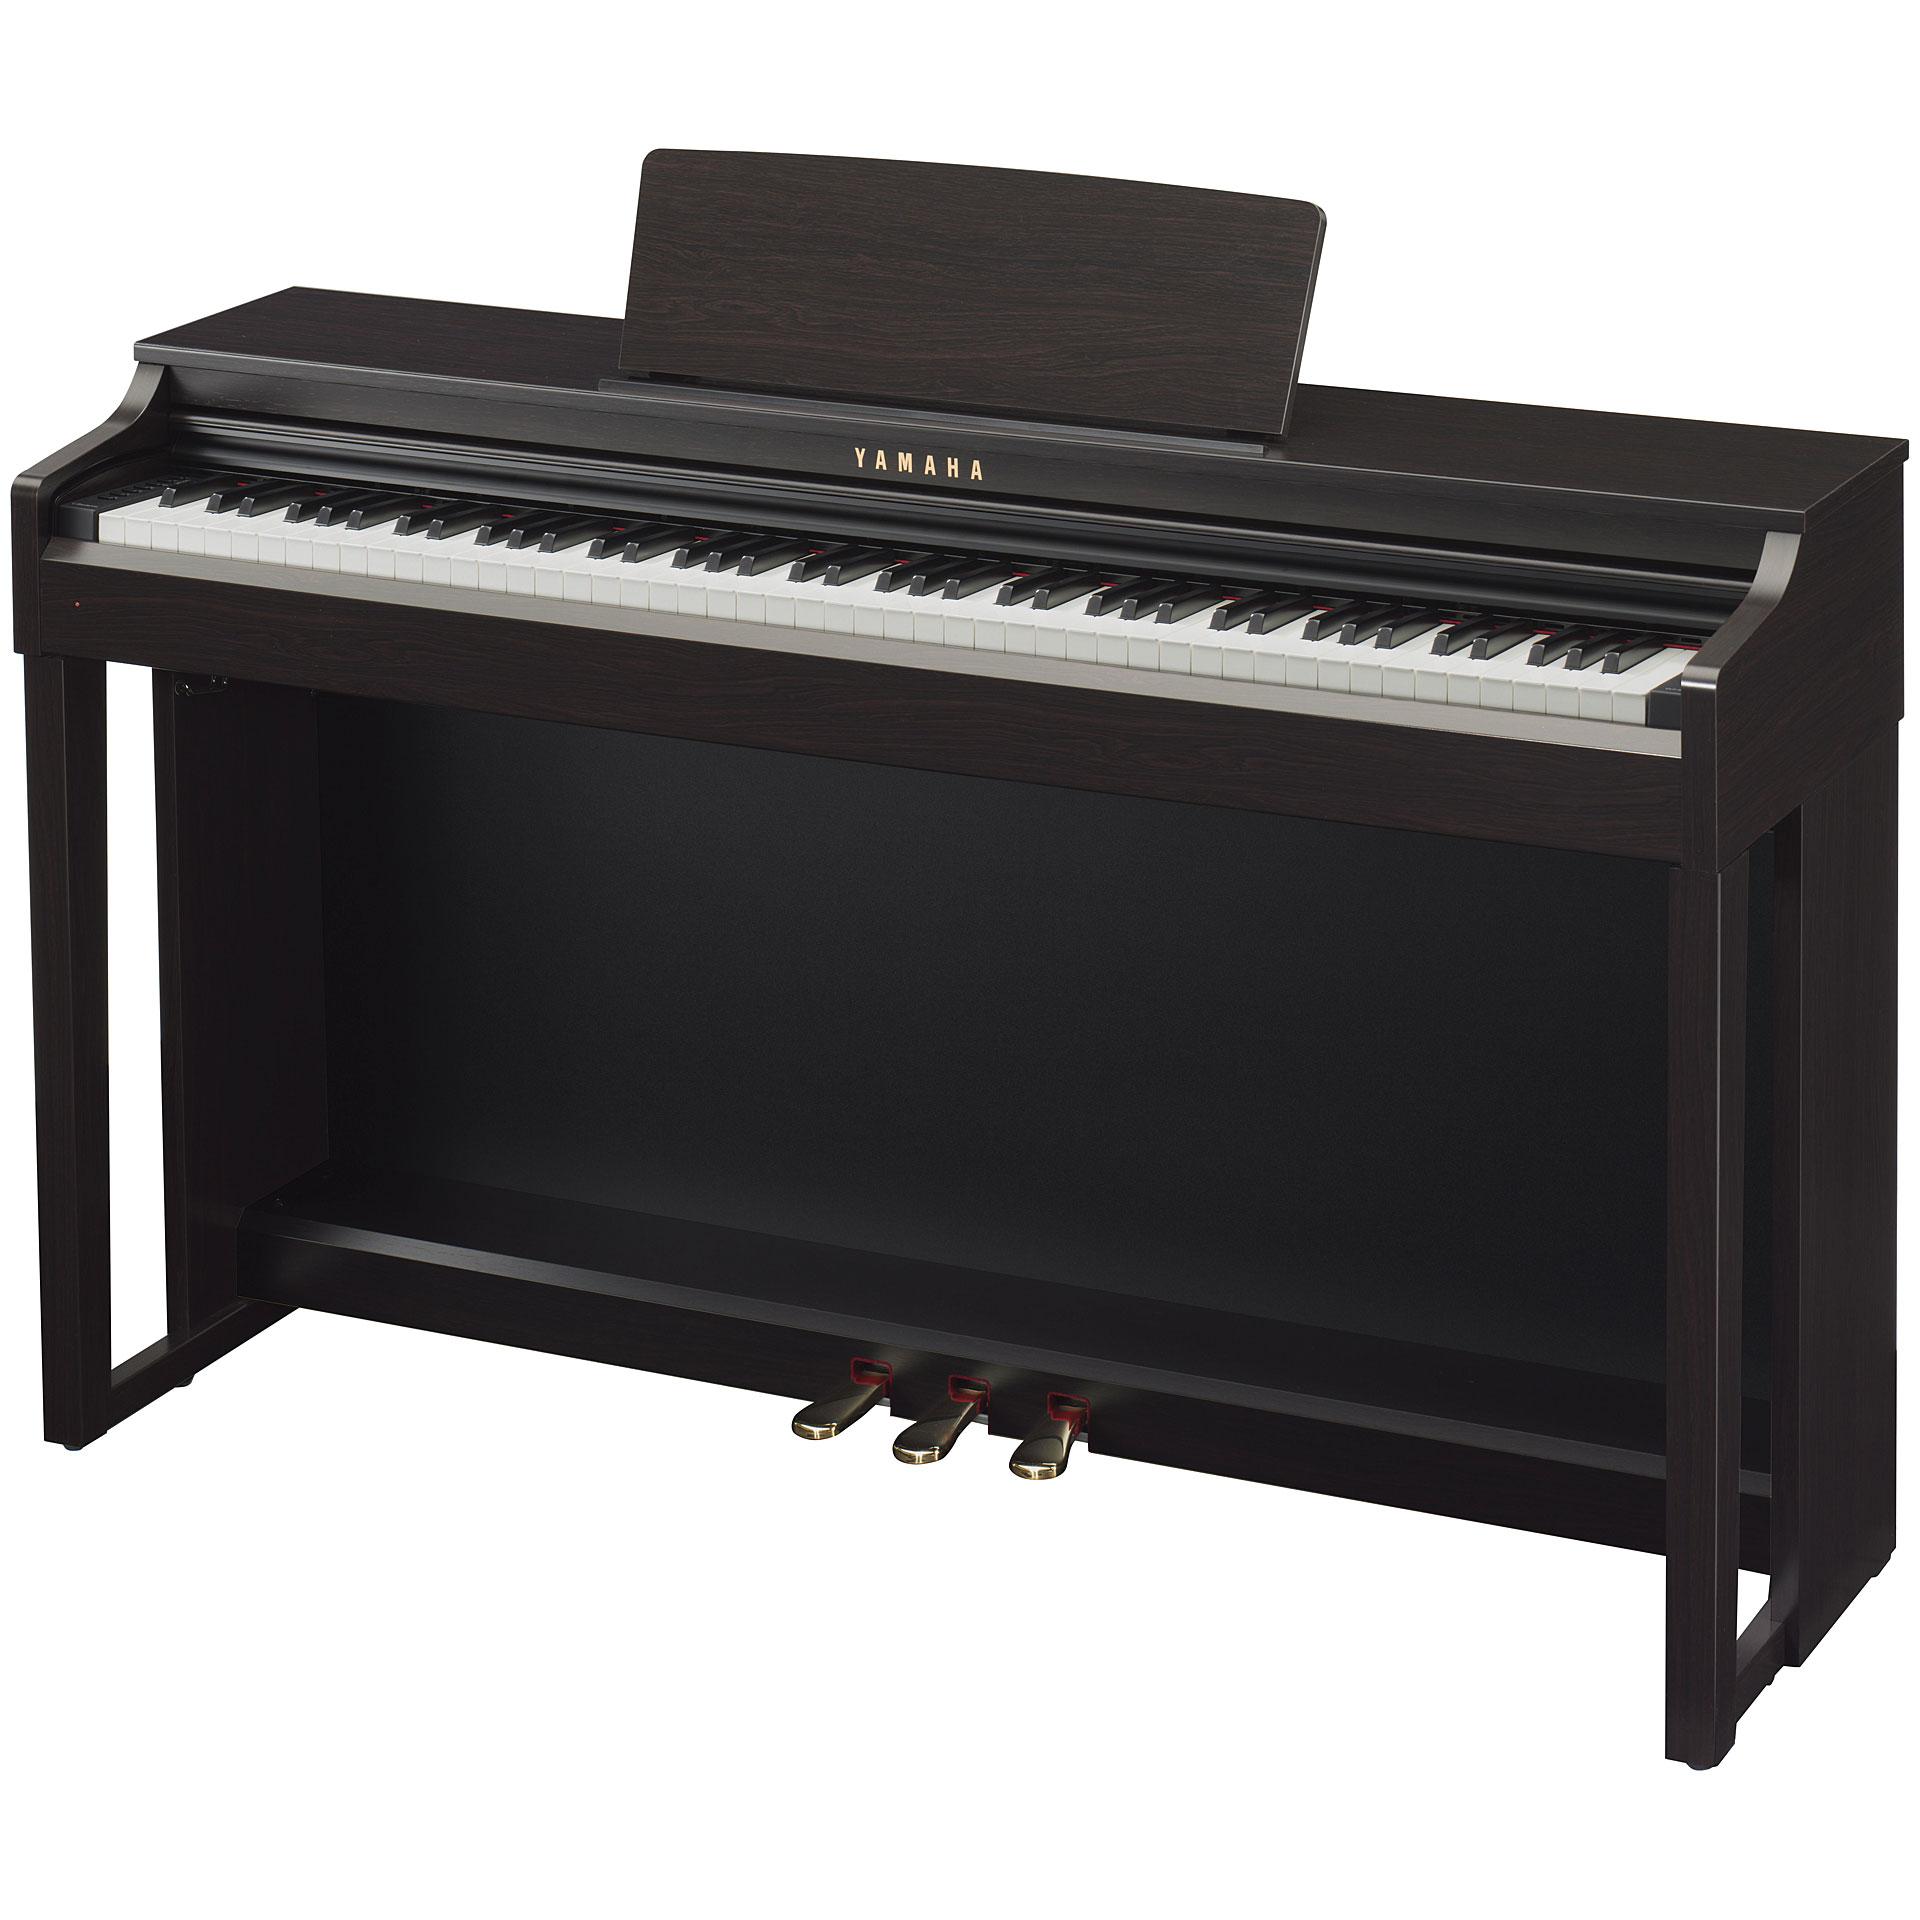 Yamaha clavinova clp 525r digital piano for Yamaha digital piano clavinova